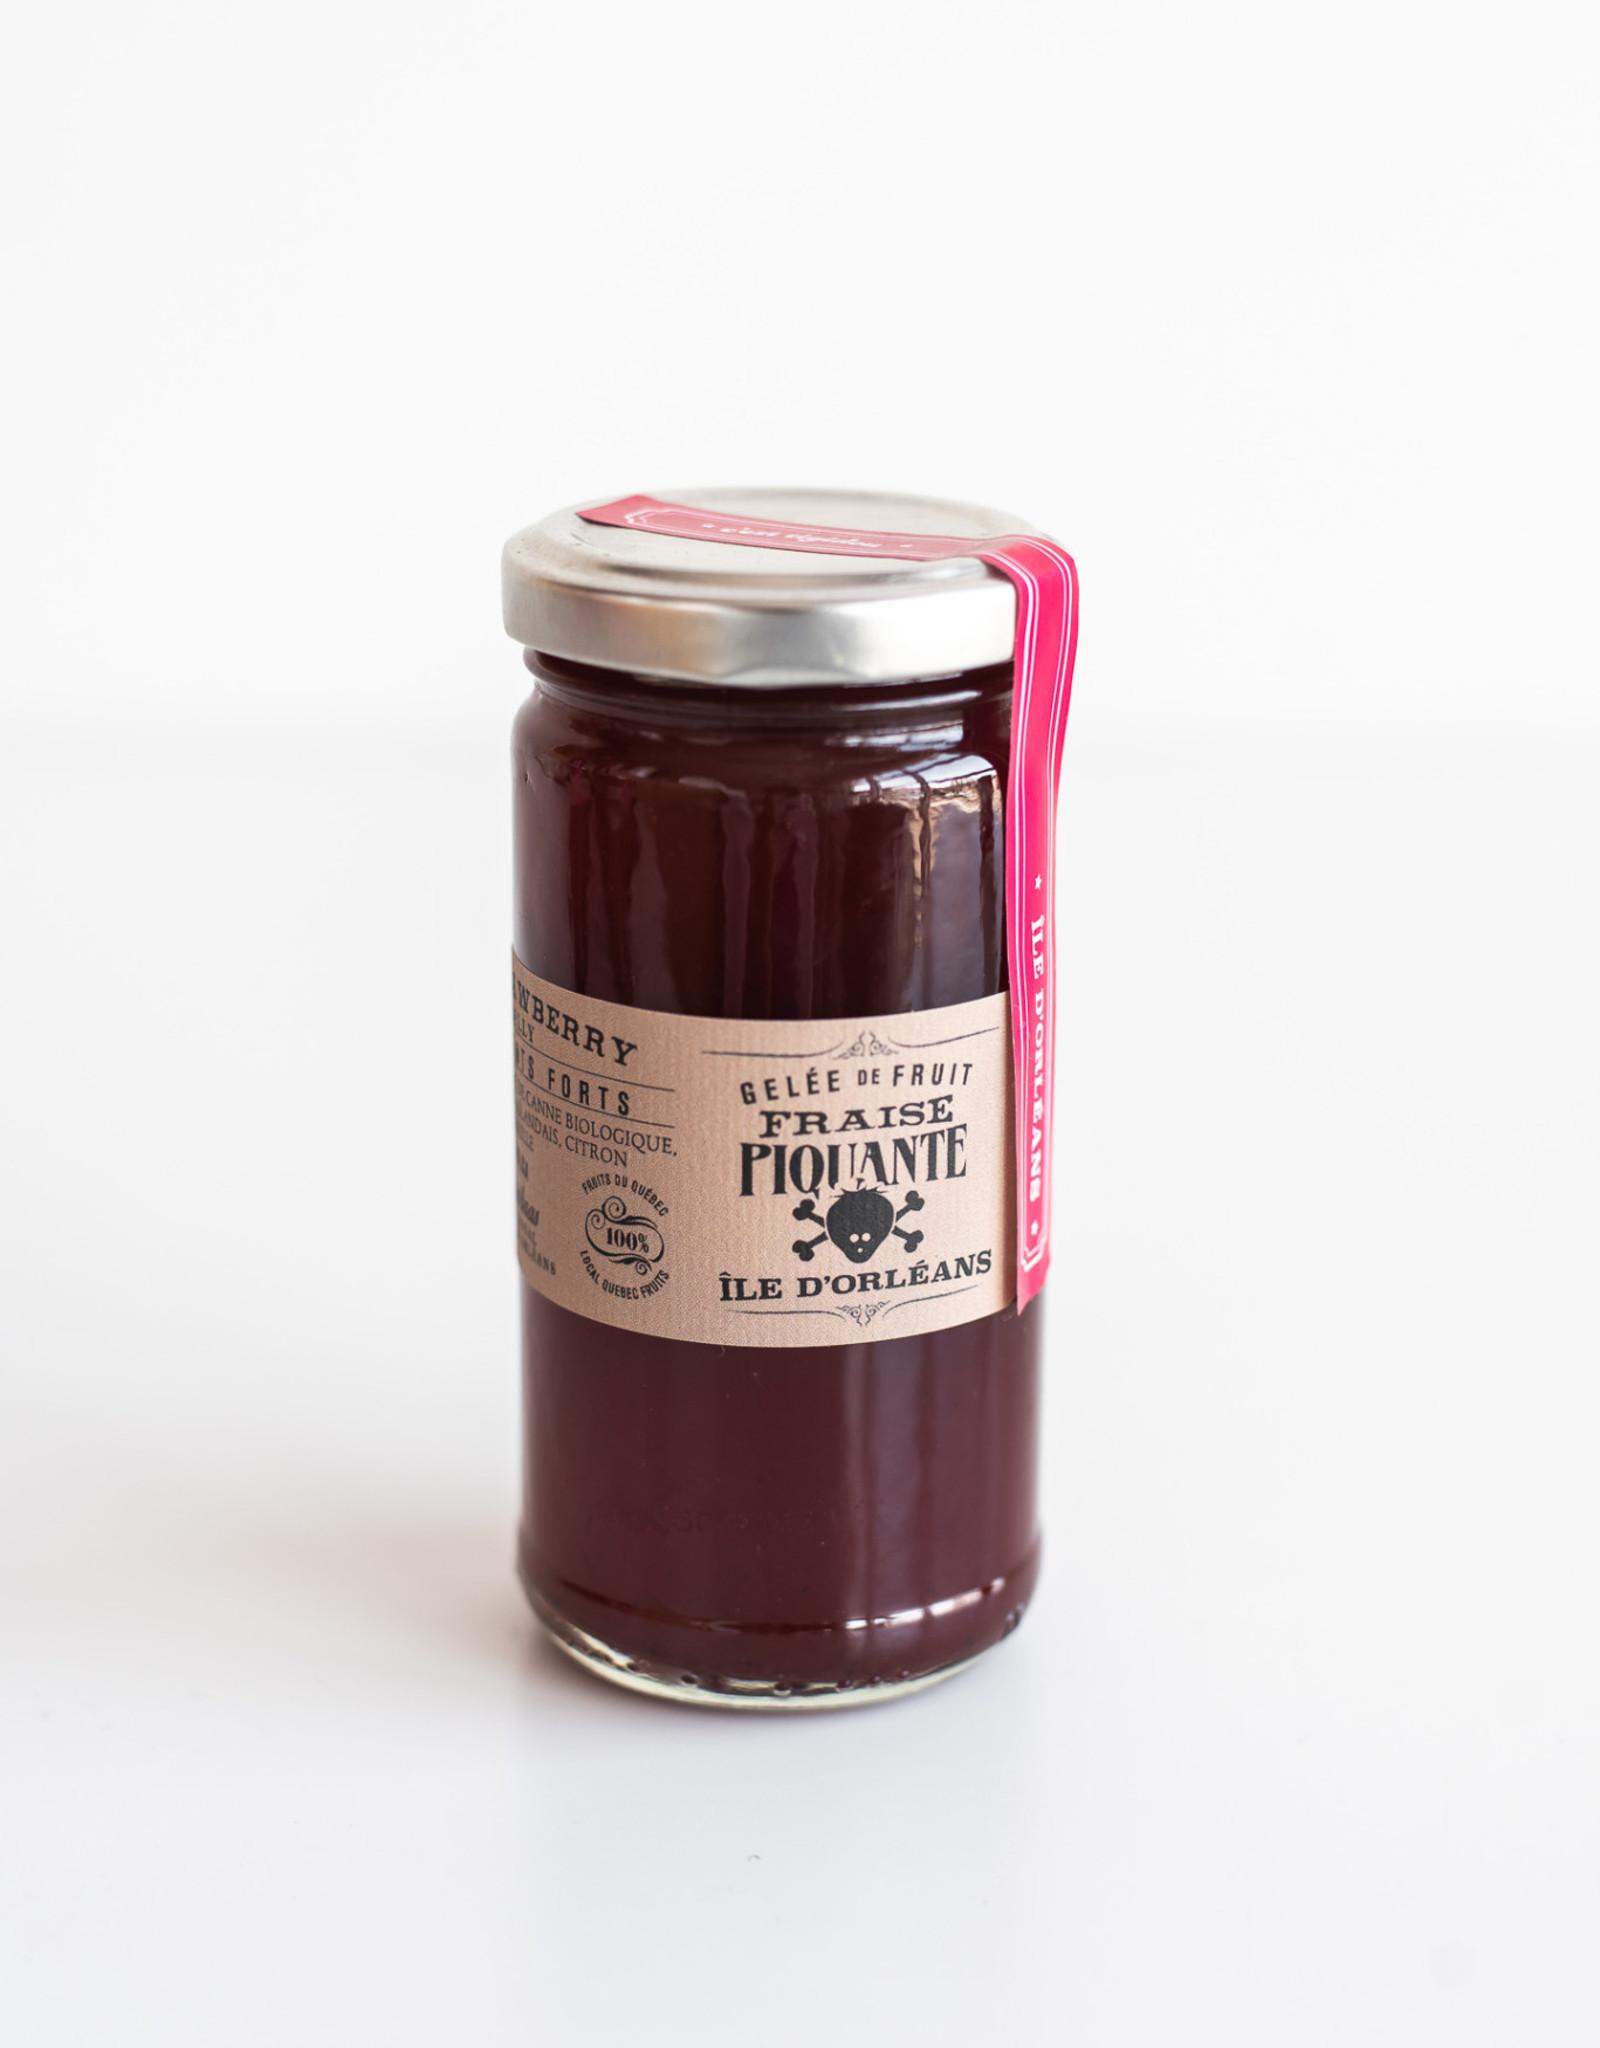 Confiturerie Tigidou Gelée de fraise Piquante